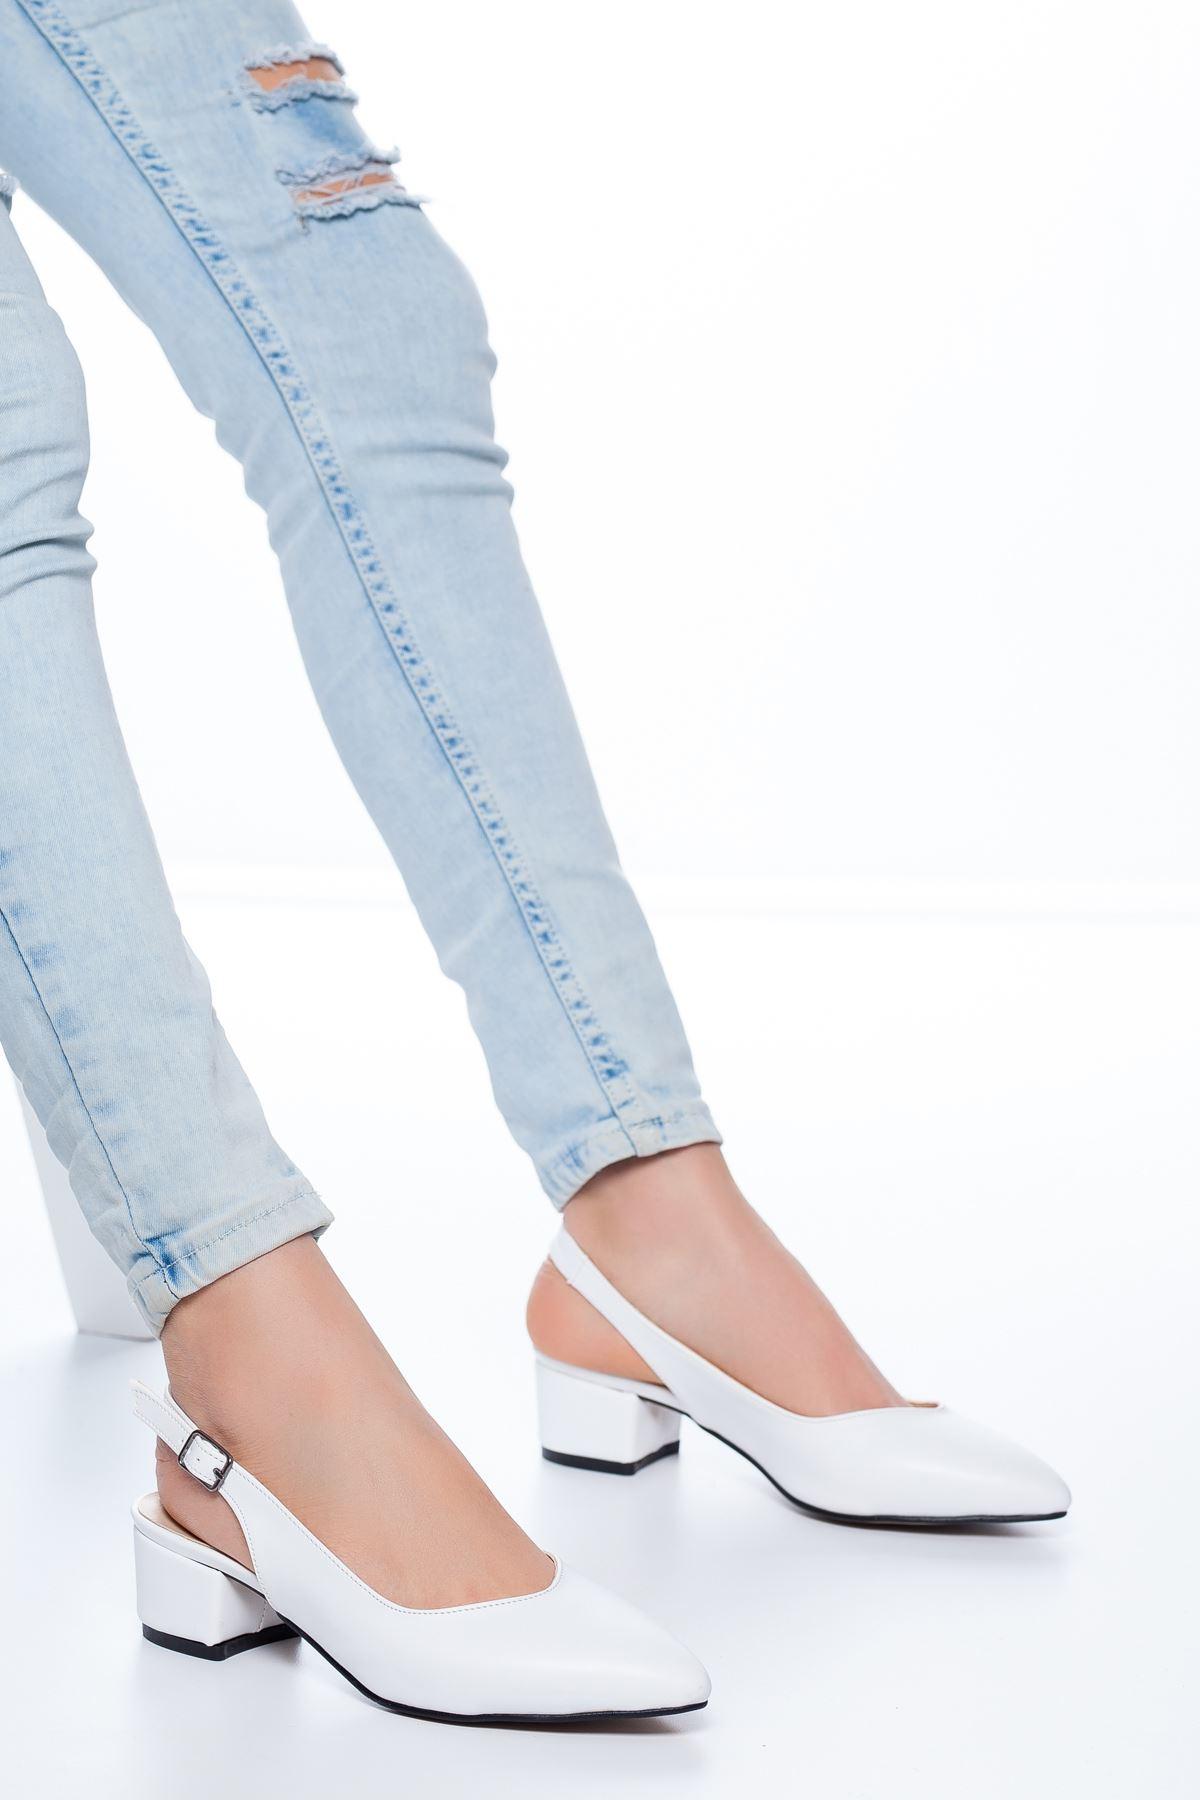 Adesa Topuklu Cilt Ayakkabı Beyaz